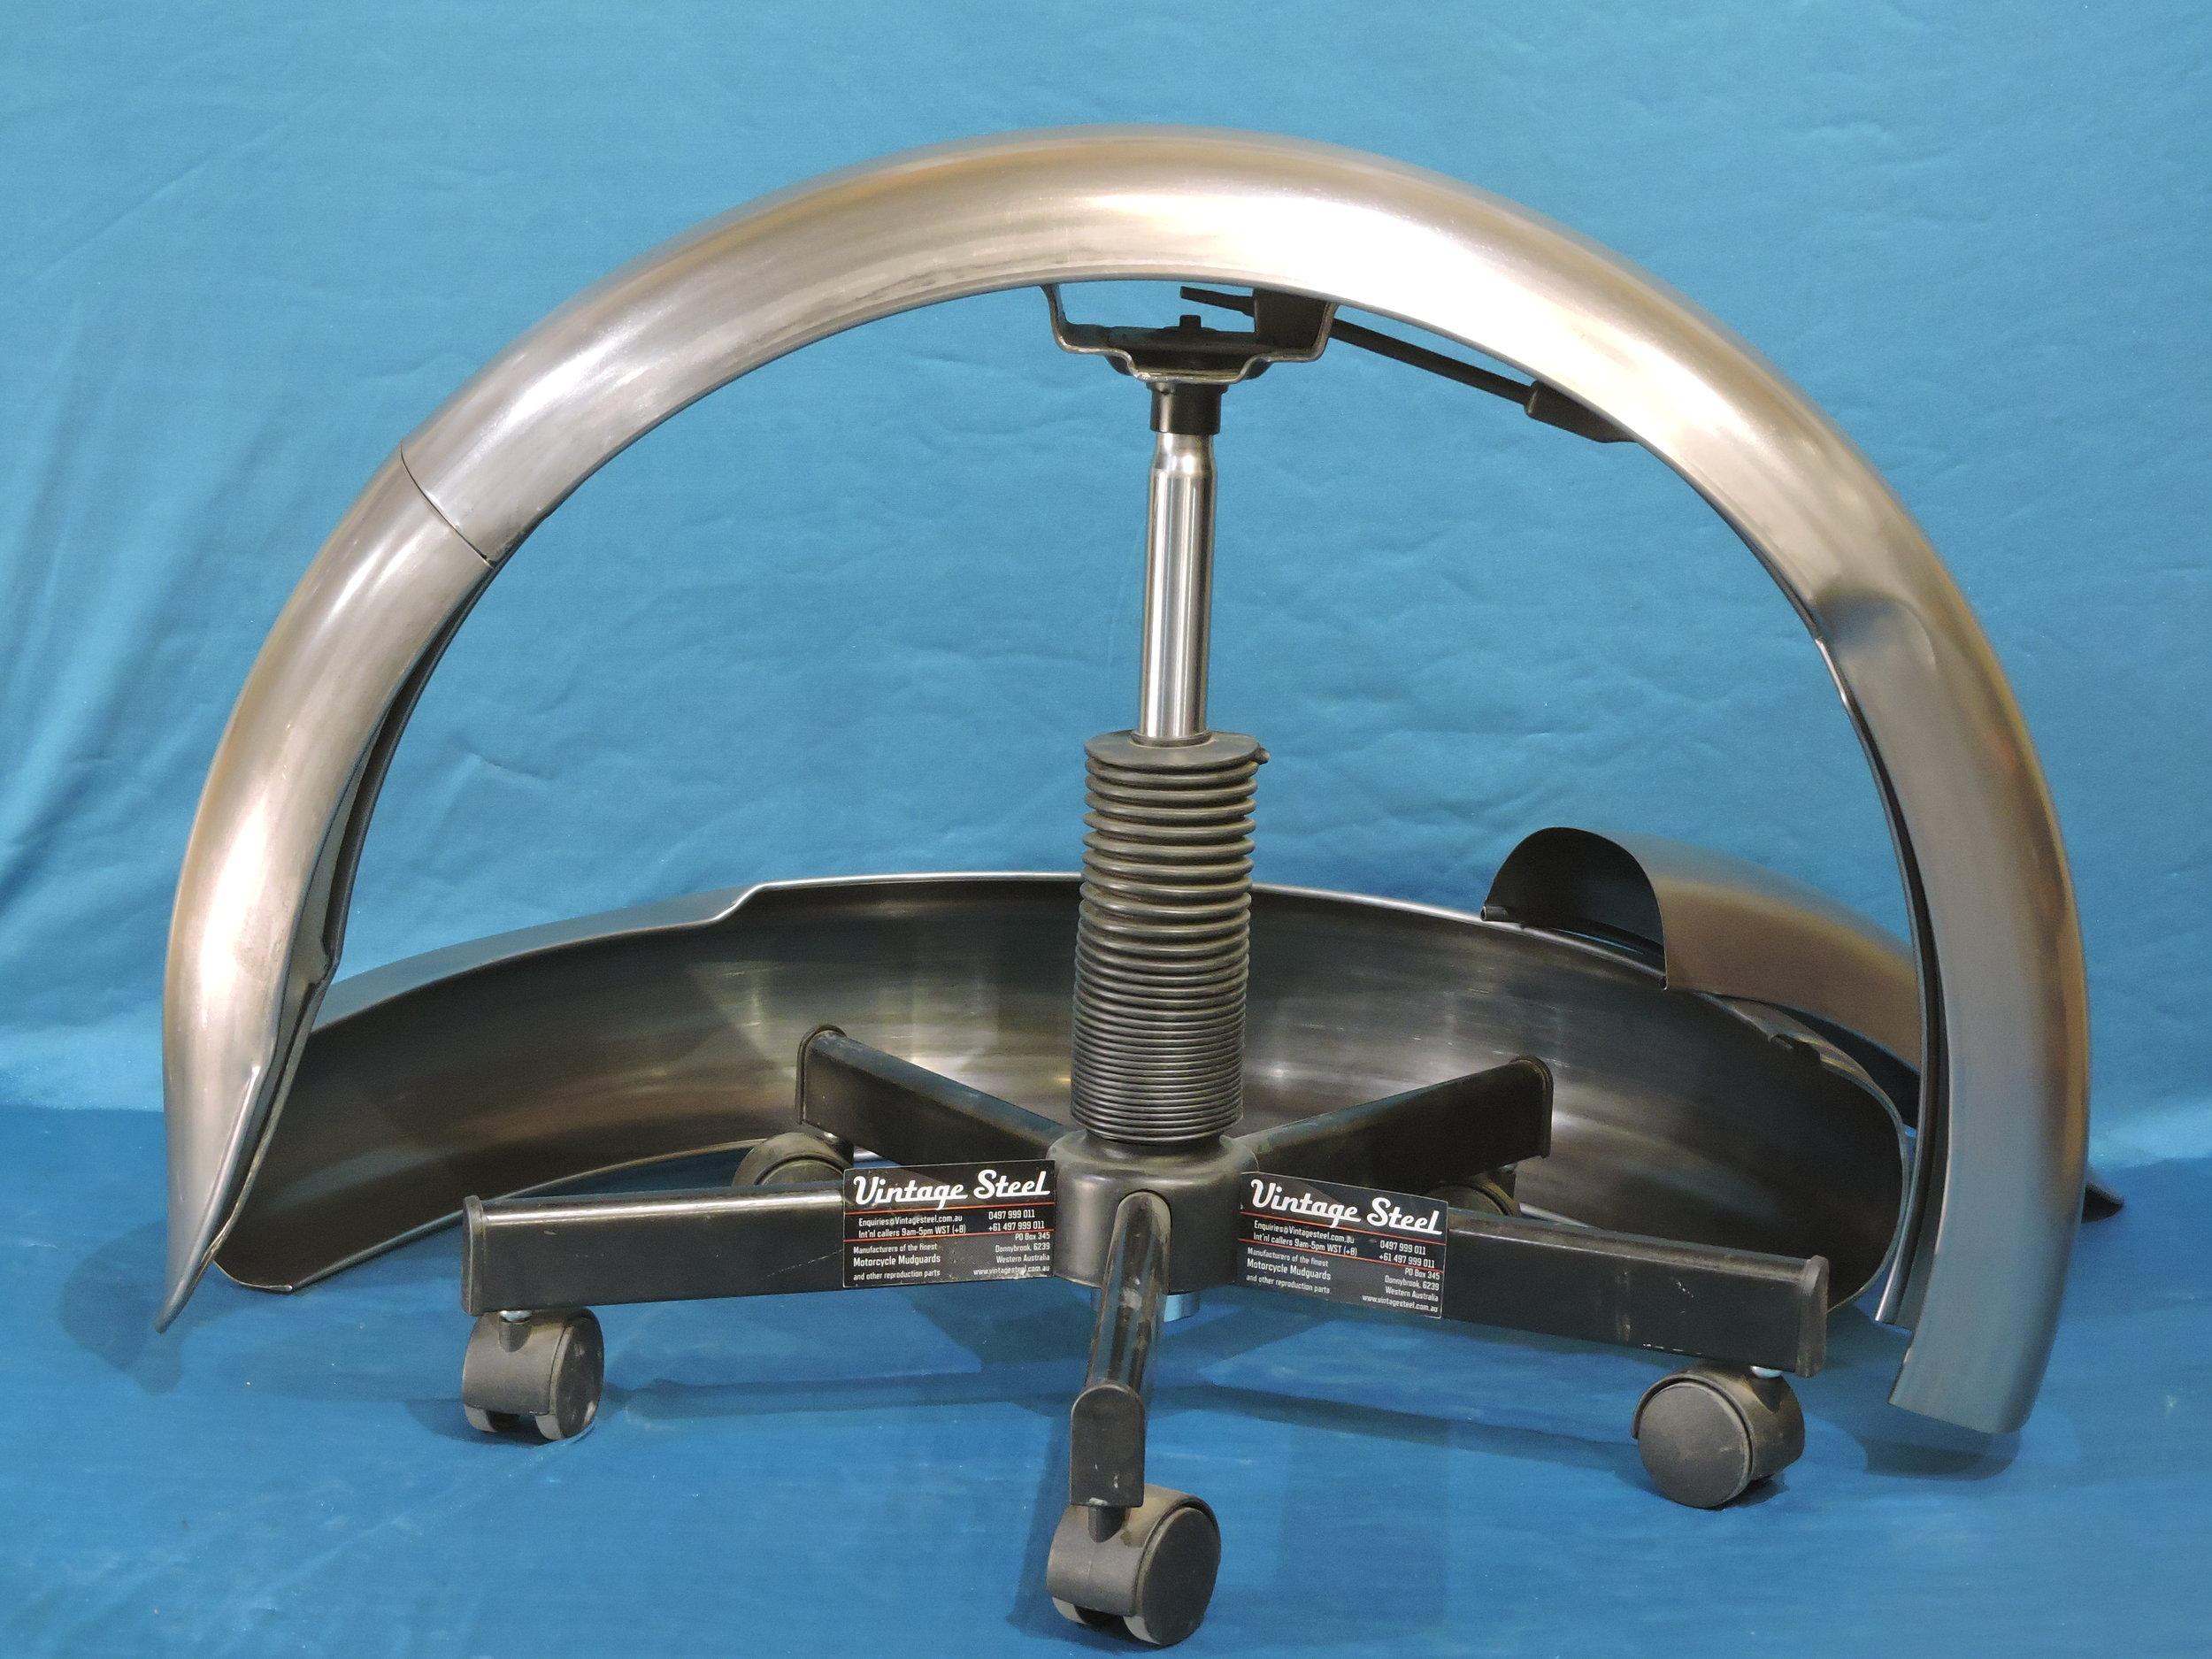 42 NORTON Inter plunger REAR 1948-52 (1).JPG